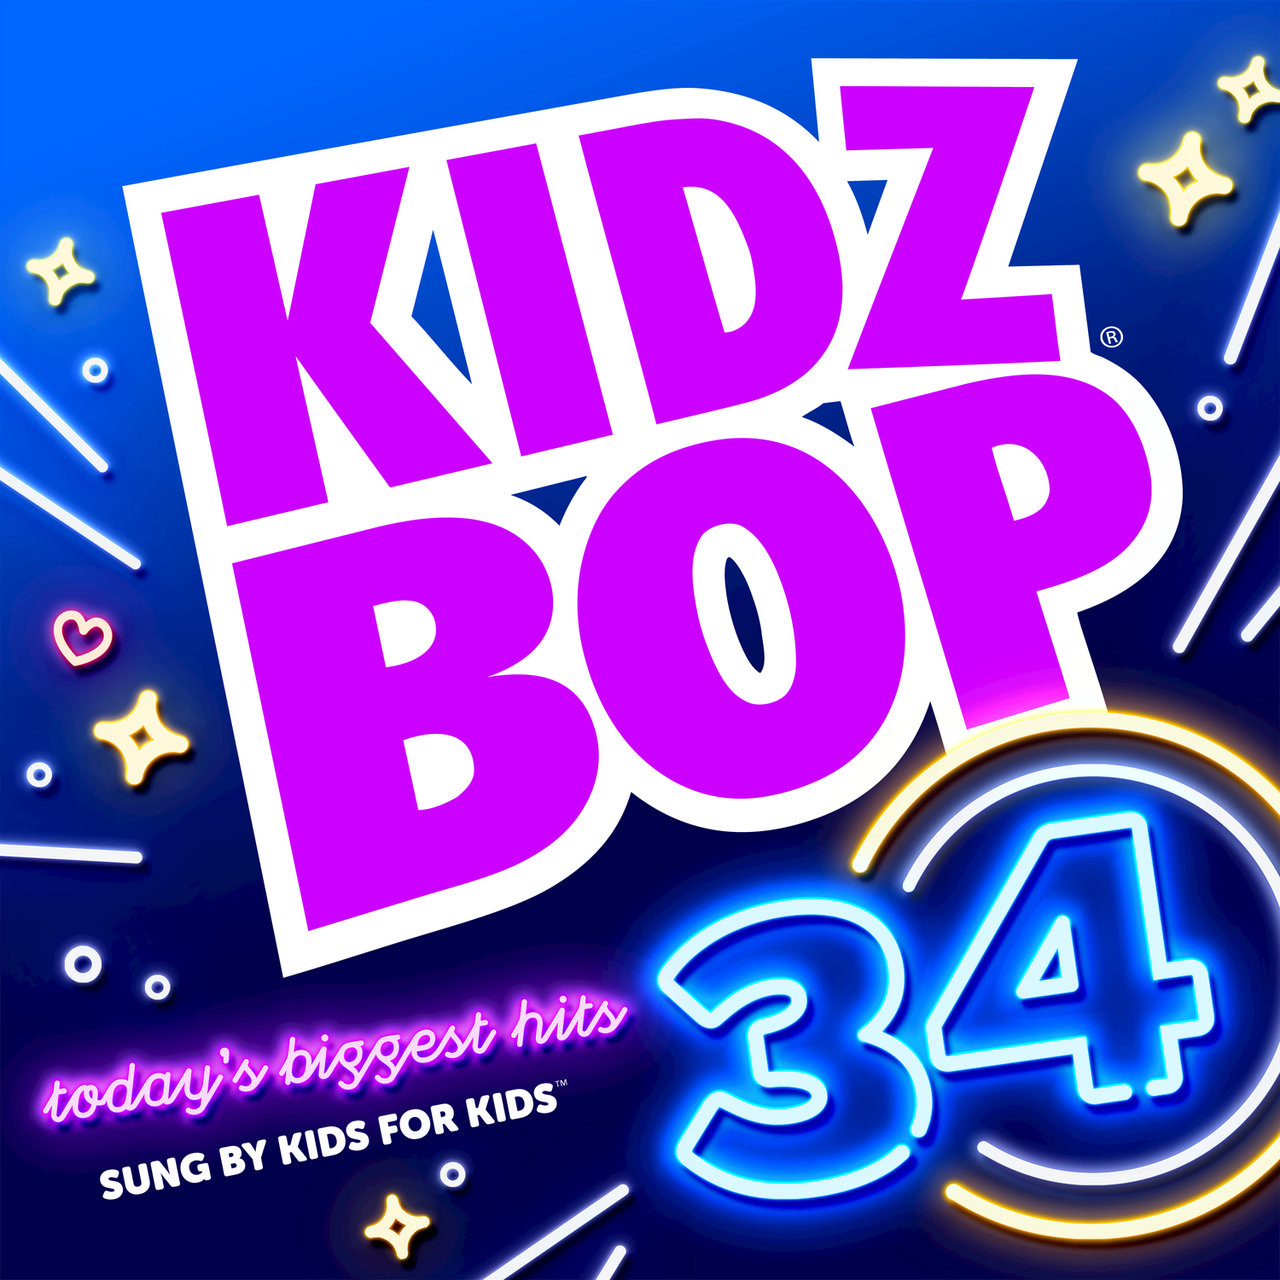 TIDAL: Listen to KIDZ BOP Christmas Party on TIDAL